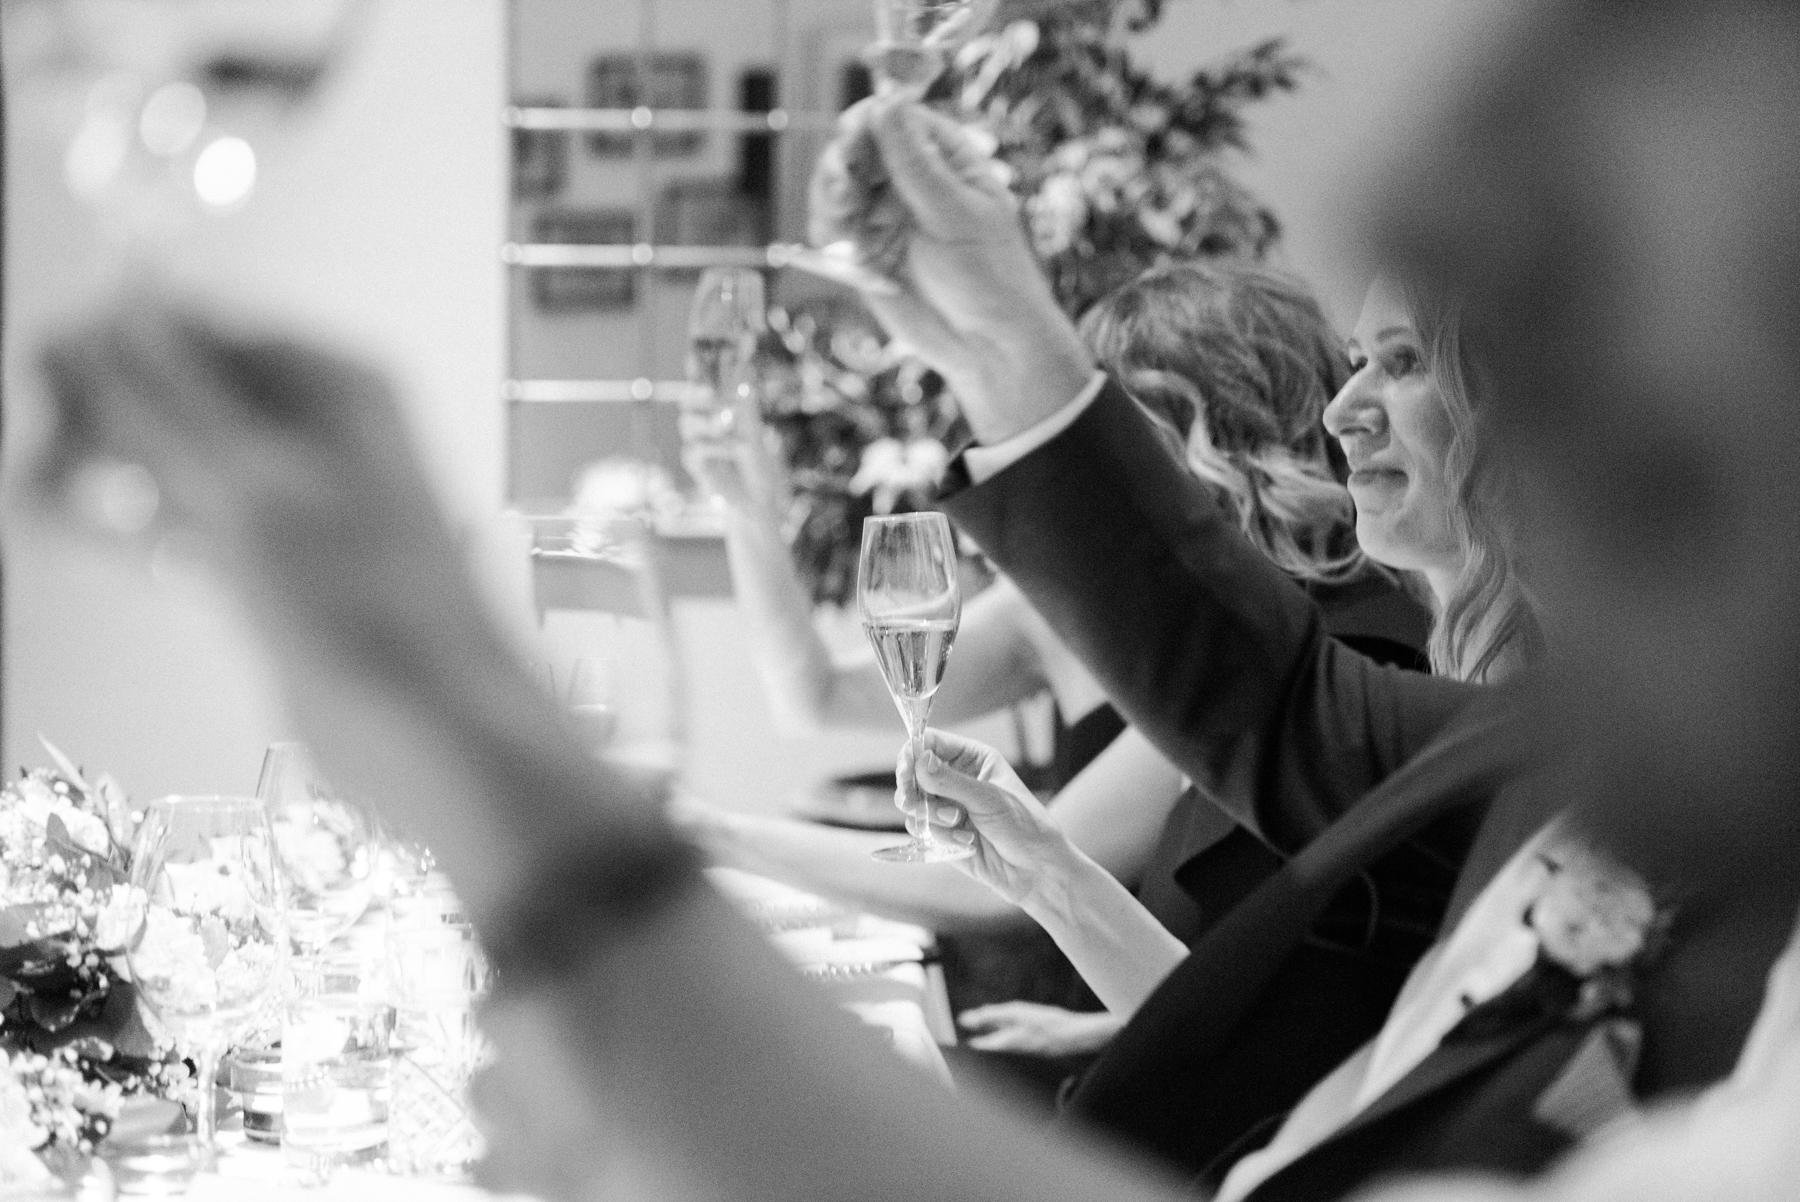 toronto_distillery_wedding-111.jpg